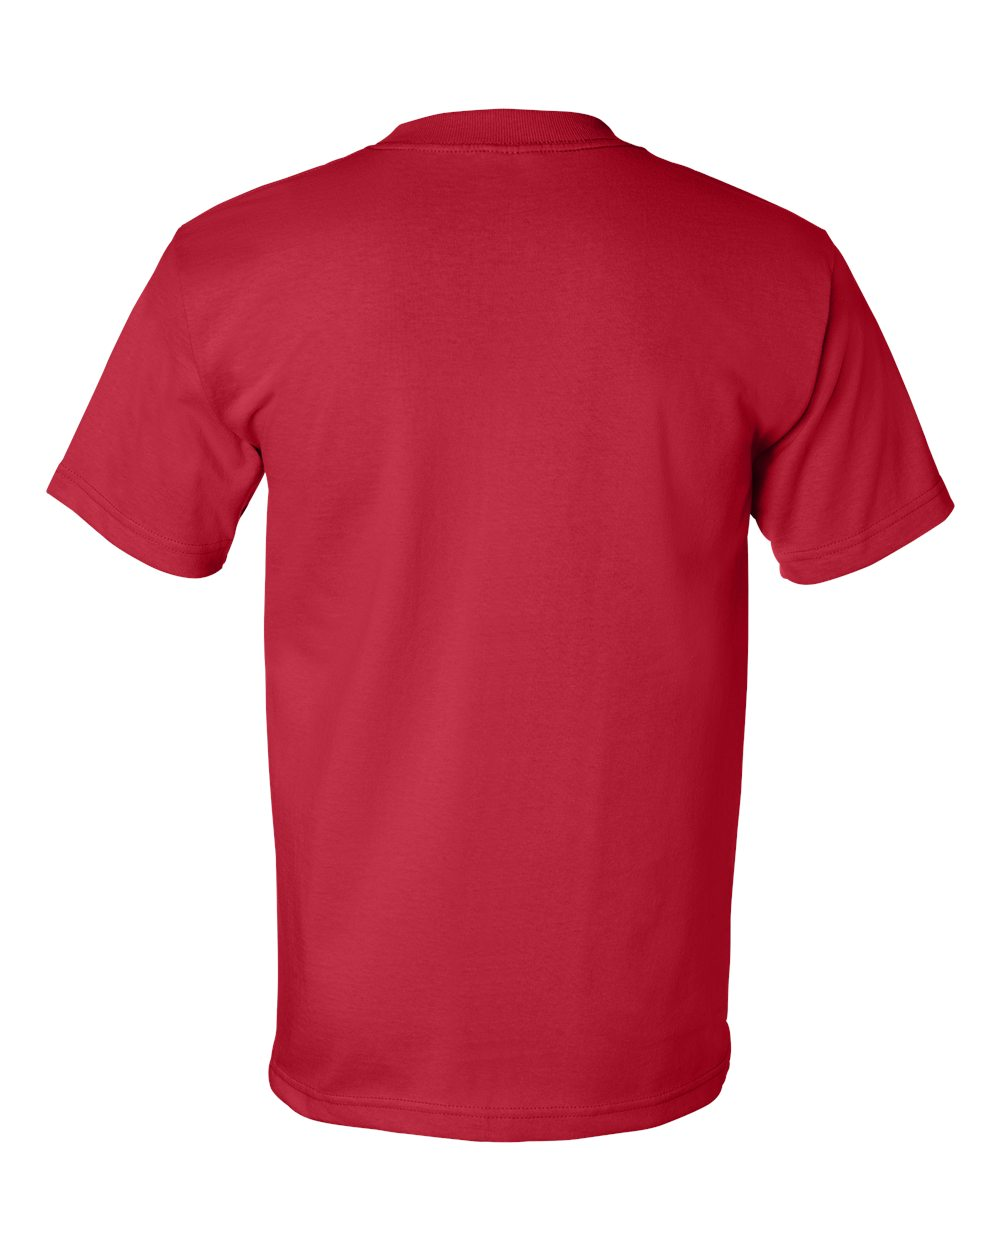 Bayside-Mens-Cotton-Blank-USA-Made-Short-Sleeve-T-Shirt-5100-up-to-5XL thumbnail 34